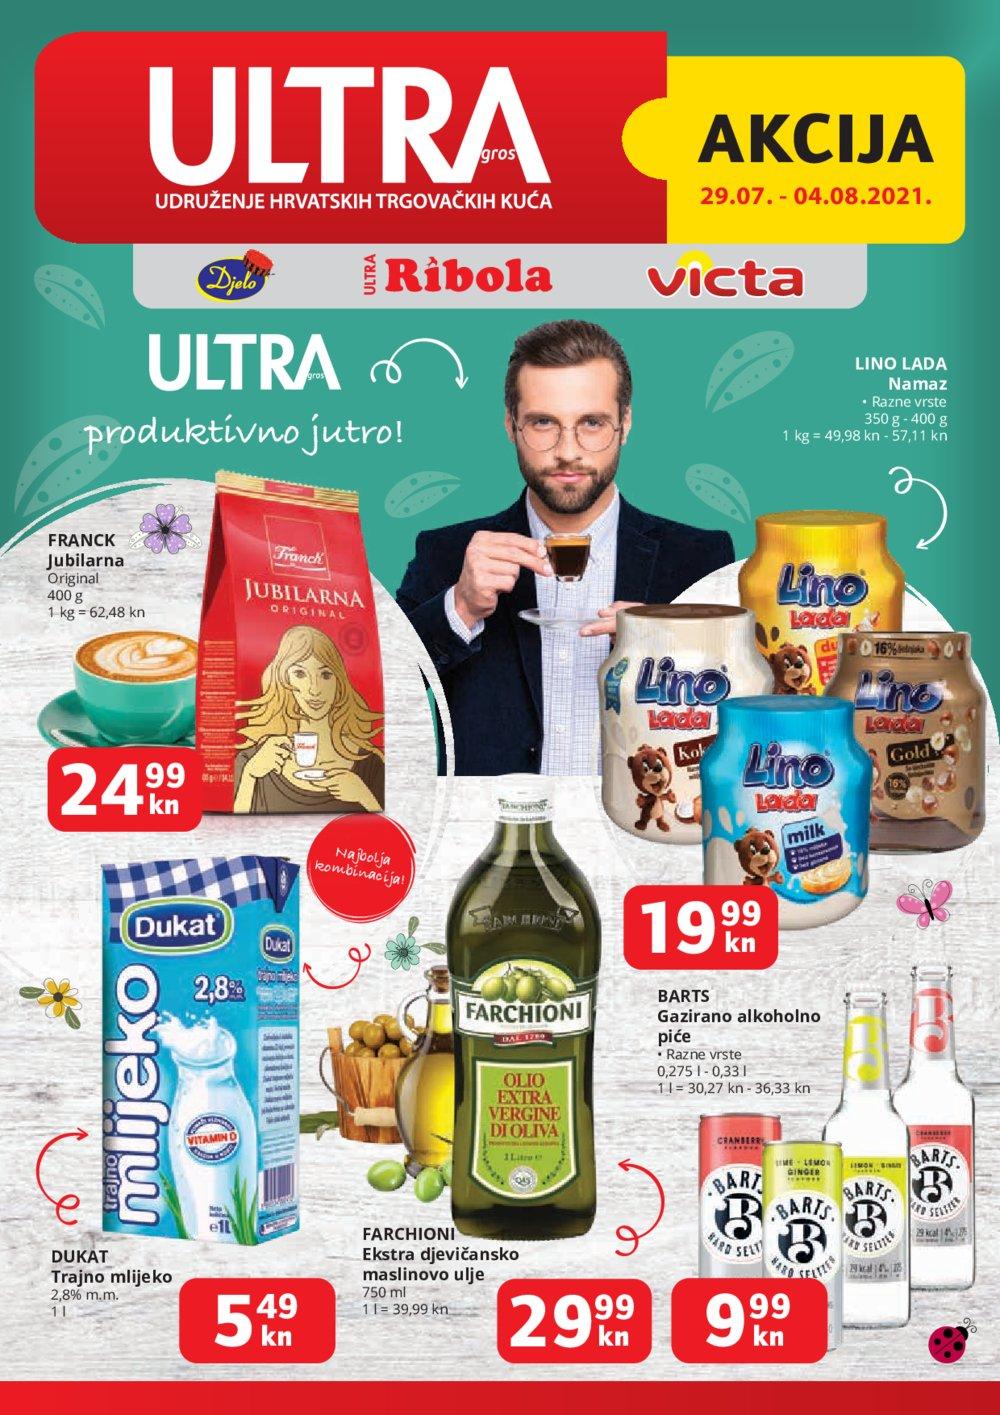 Ribola katalog Akcija Ultra gros 29.07.-04.08.2021.